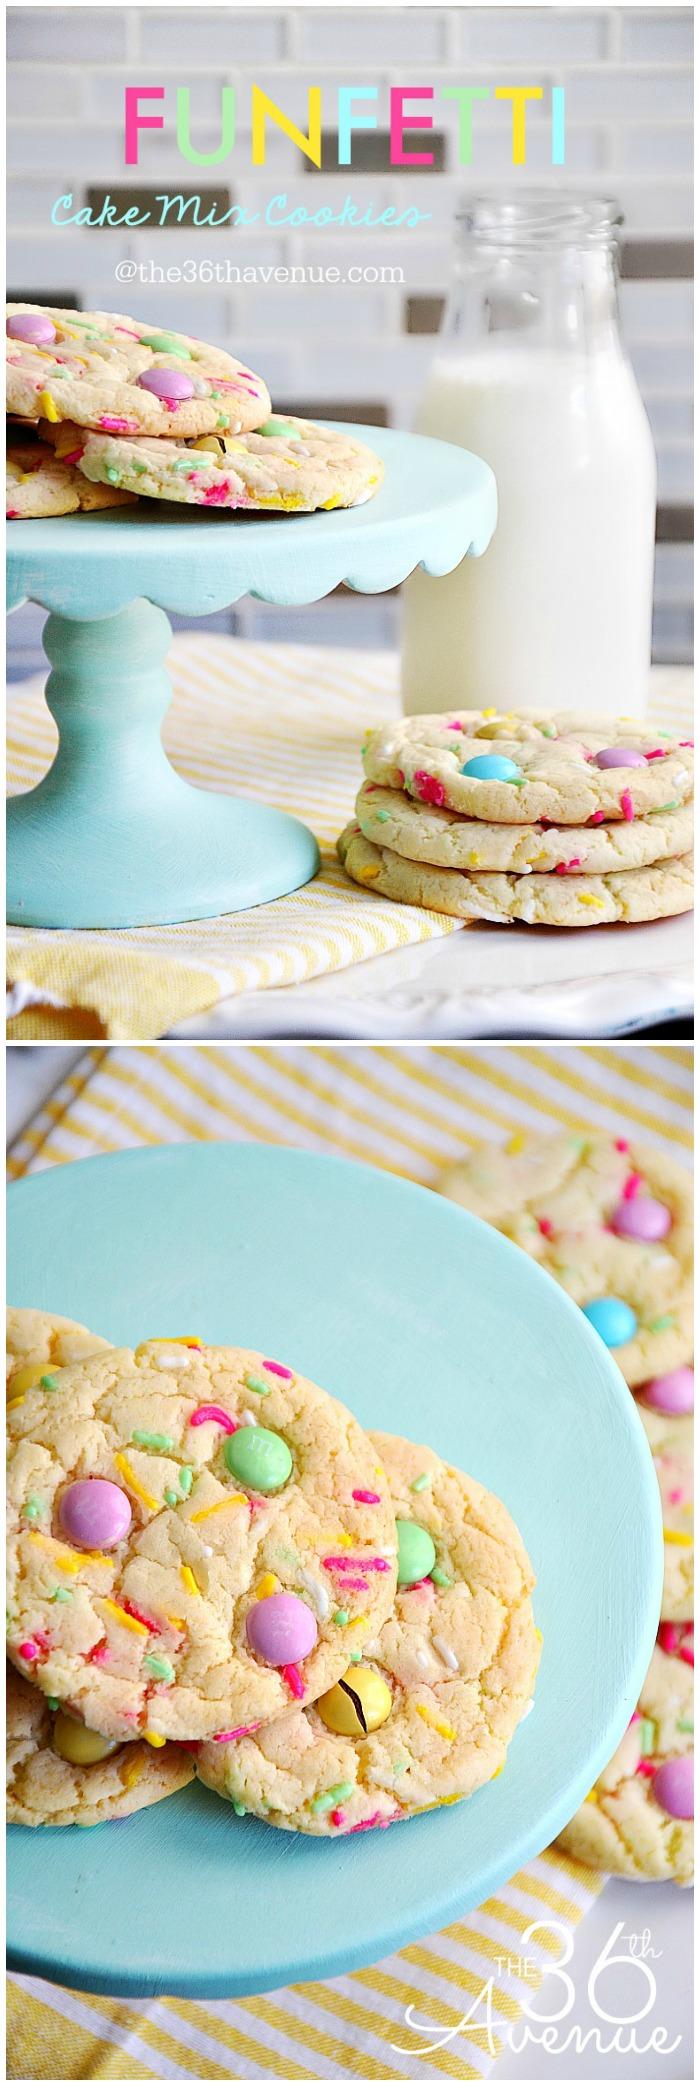 Funfetti Cookie Recipe From Cake Box